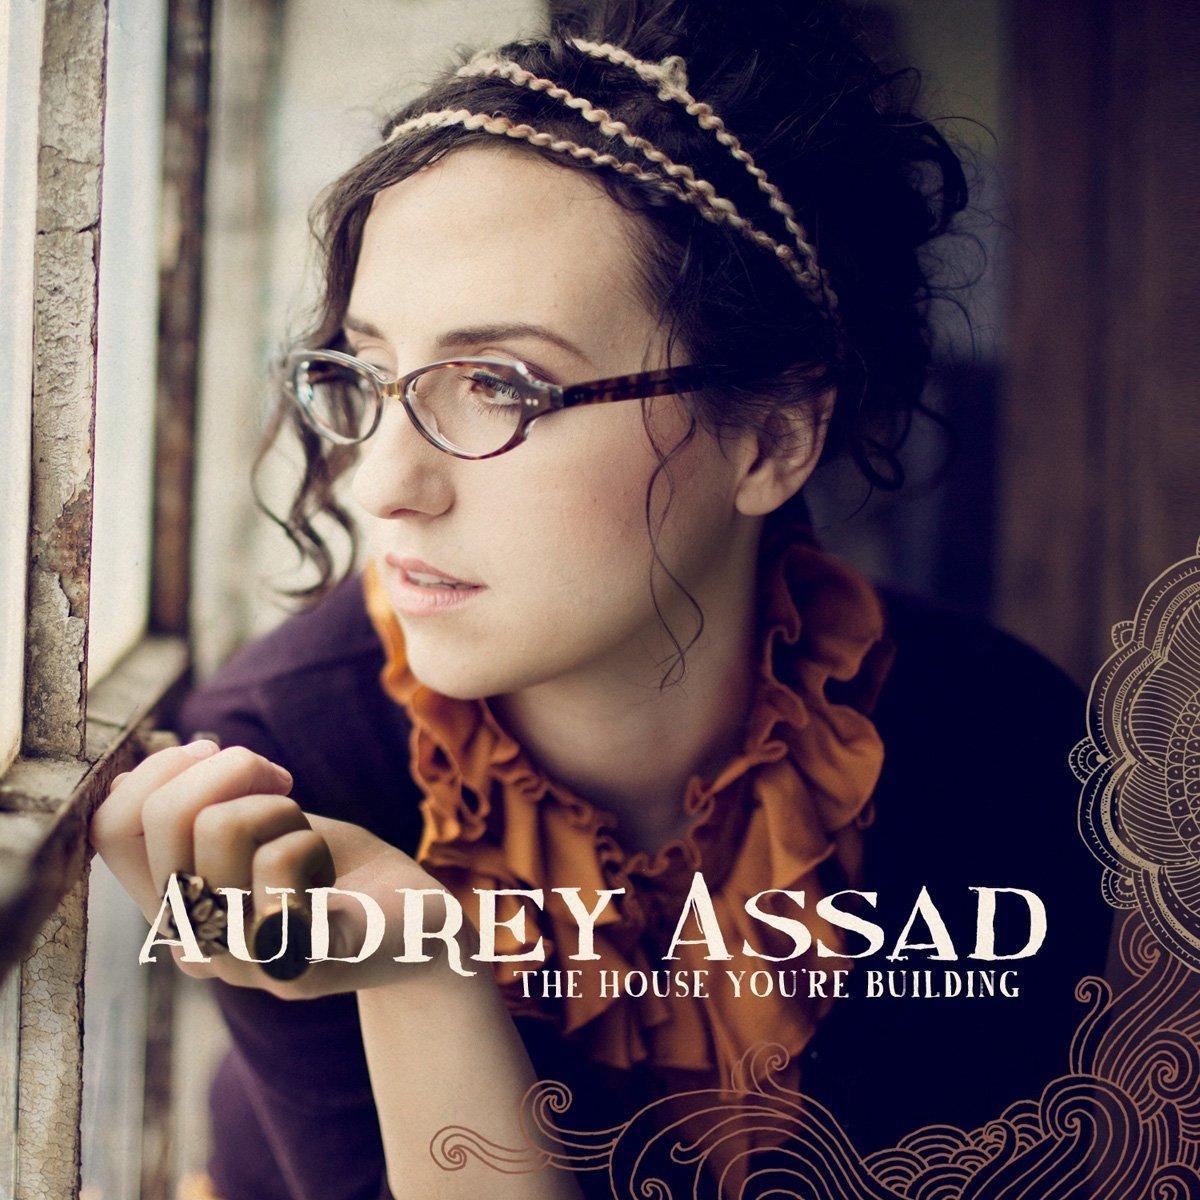 The house you re building by audrey assad